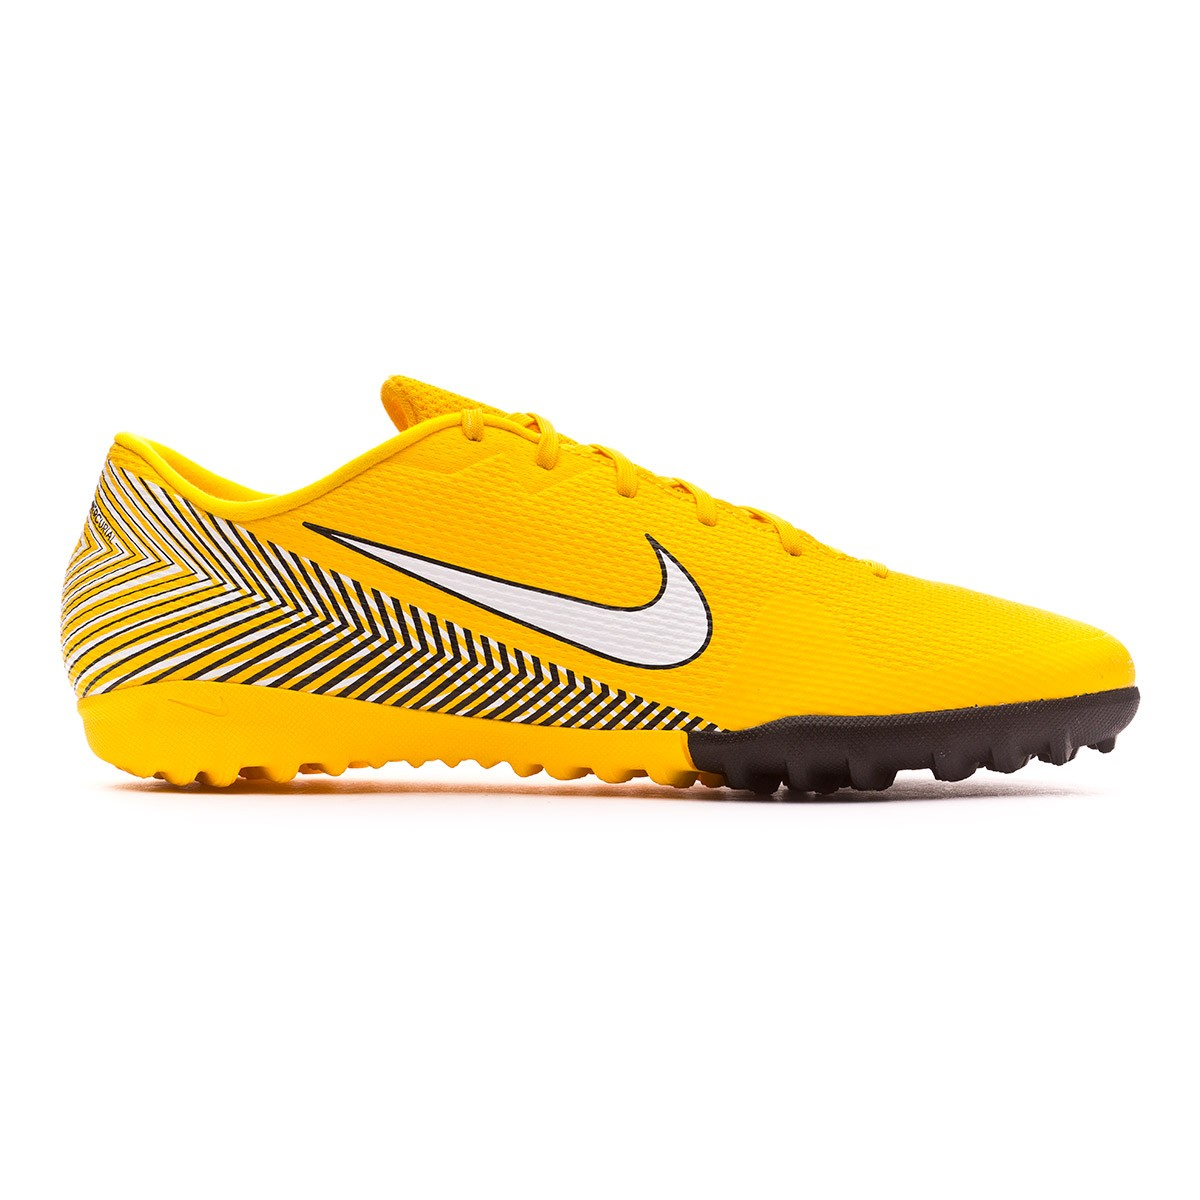 8dbc1590354 Football Boot Nike Mercurial VaporX XII Academy Turf Neymar Yellow-Black -  Tienda de fútbol Fútbol Emotion